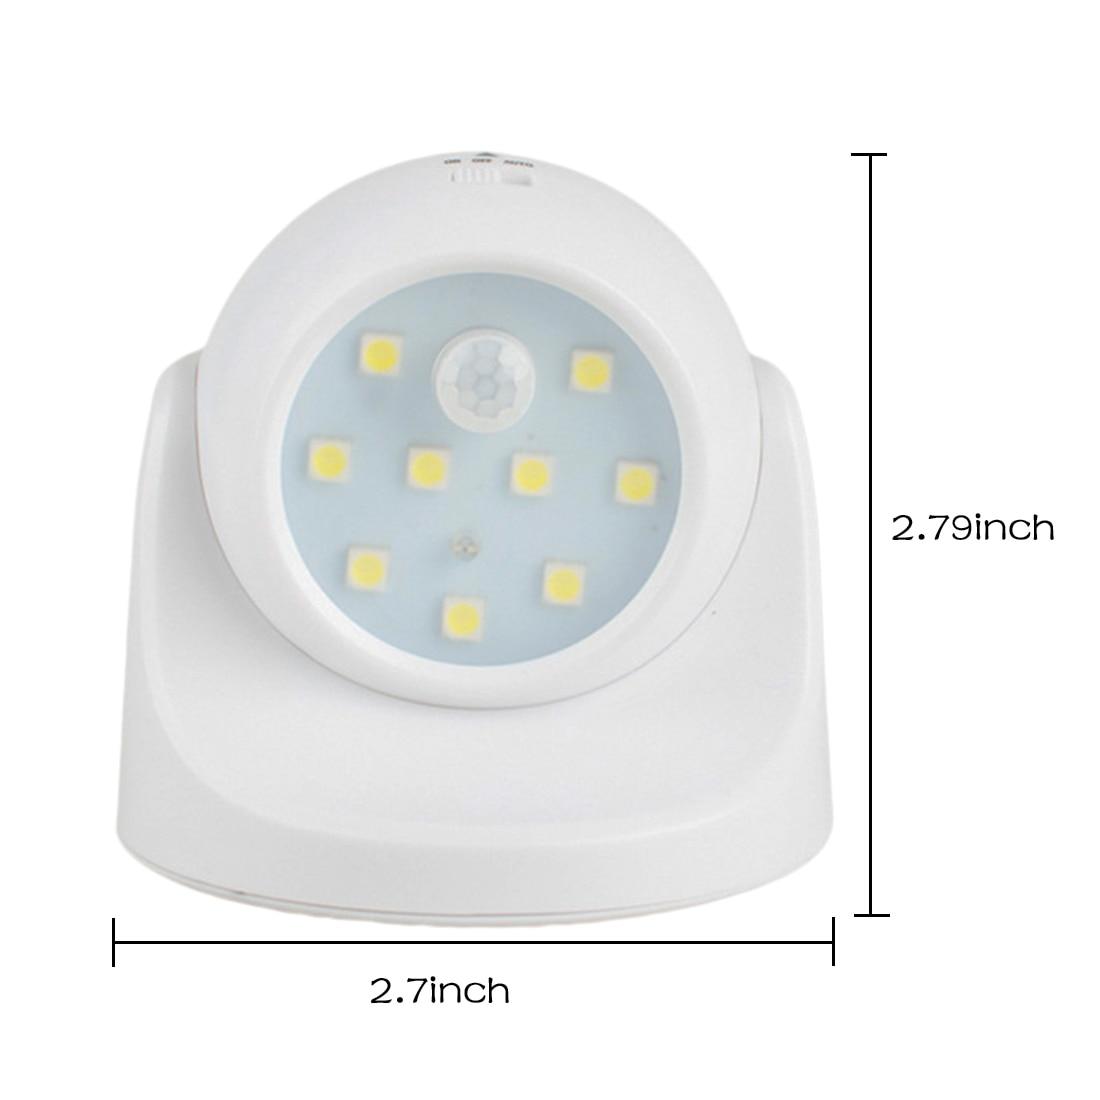 9 LED Motion Sensor Night Light 360 Degree Rotation Portable Night Light Auto IR Infrared Luminary Lamp Children LED sn101 mini 360 degree rotation 0 1w yellow light auto sensor night lamp white 2 round pin plug